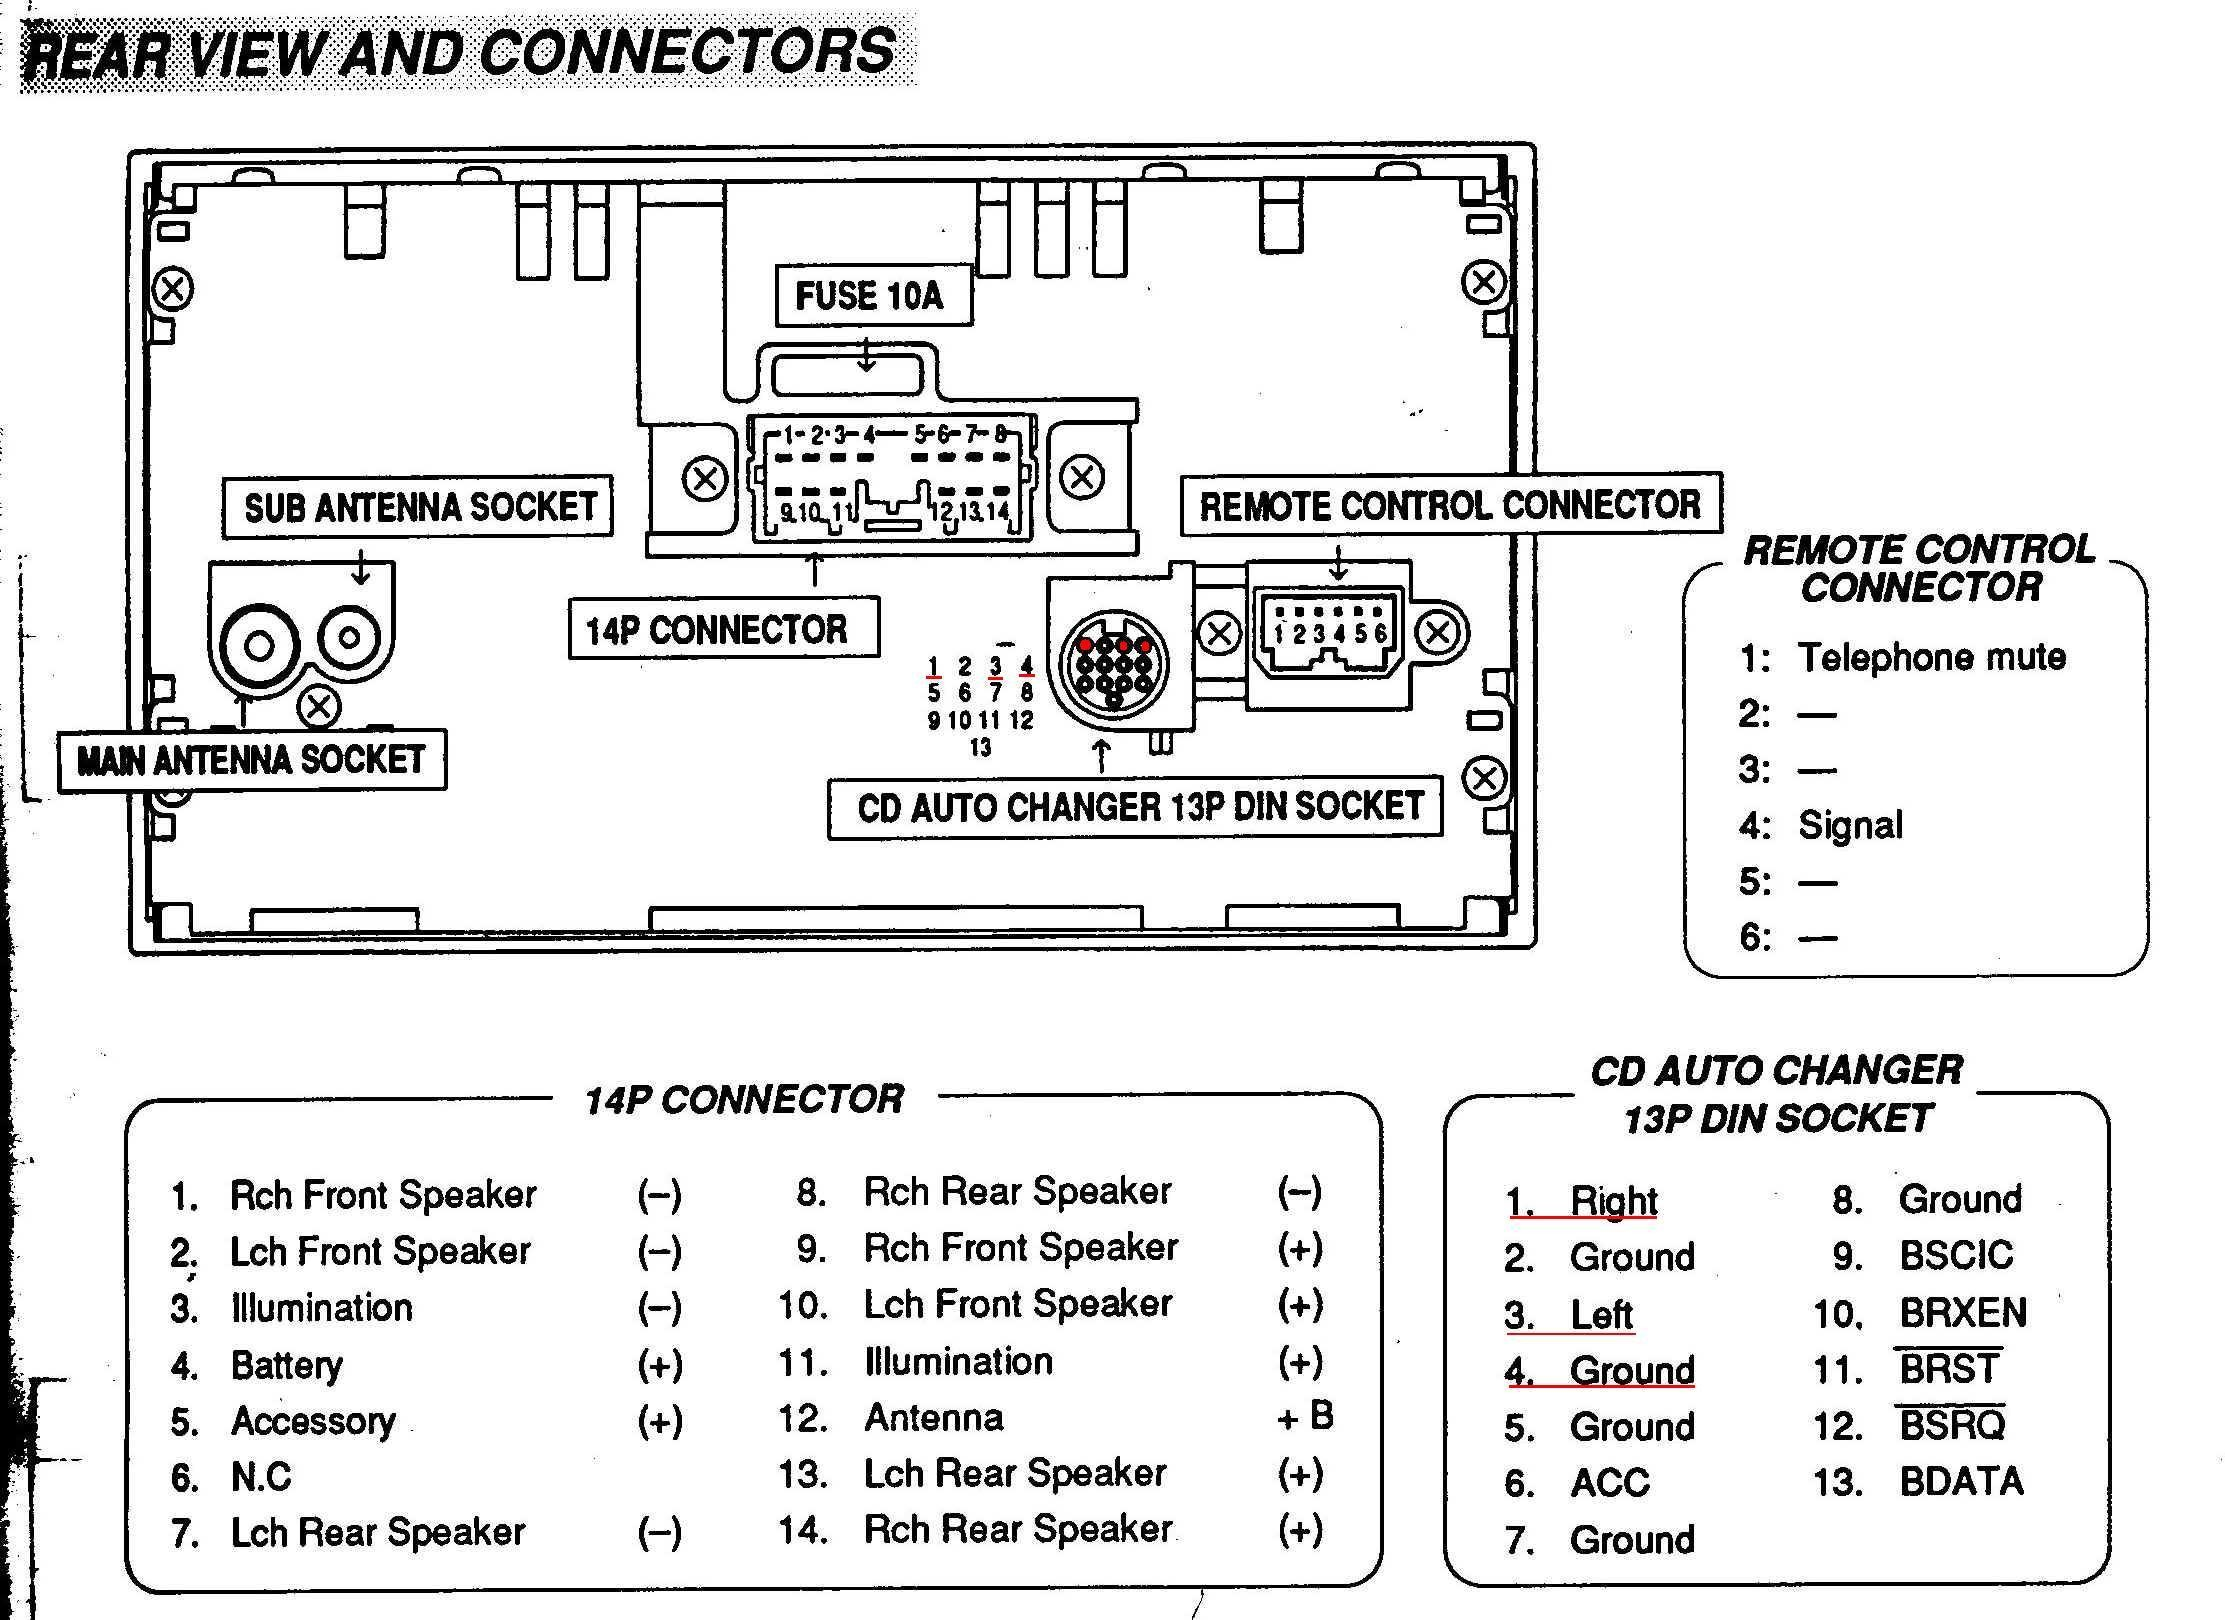 2002 Jeep Grand Cherokee Radio Wiring Diagram Unique Wiring Mitsubishi  Montero Sport Front Wheel Bearings Mitsubishi Montero Sport Radio Wiring  Diagram